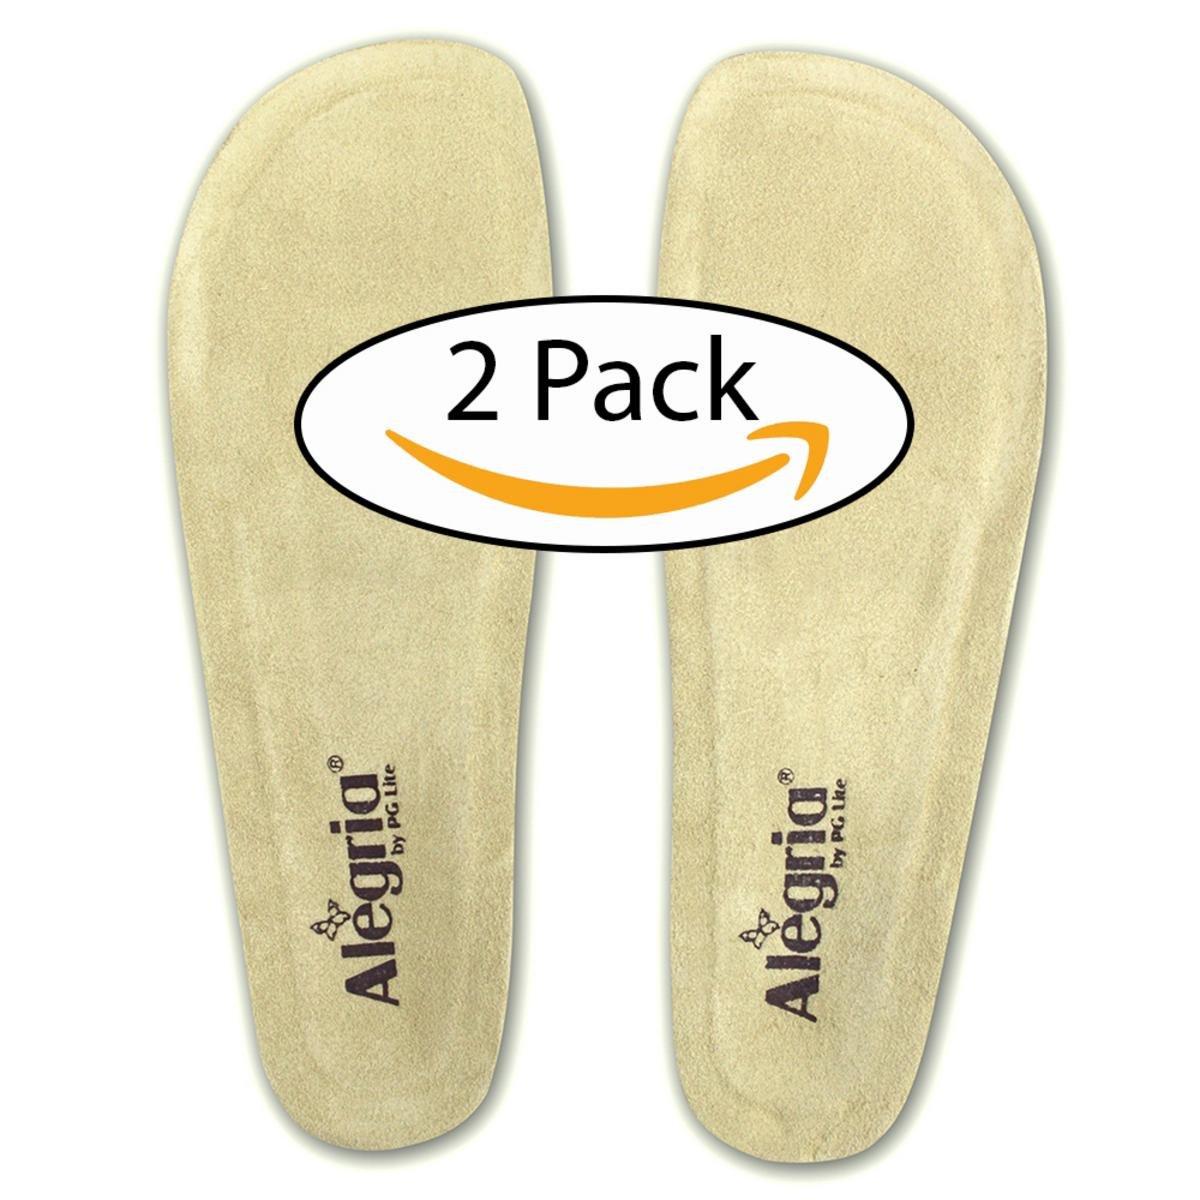 Alegria Women's 2 PACK Replacement Footbed Tan 38 (US Women's 8-8.5) Regular